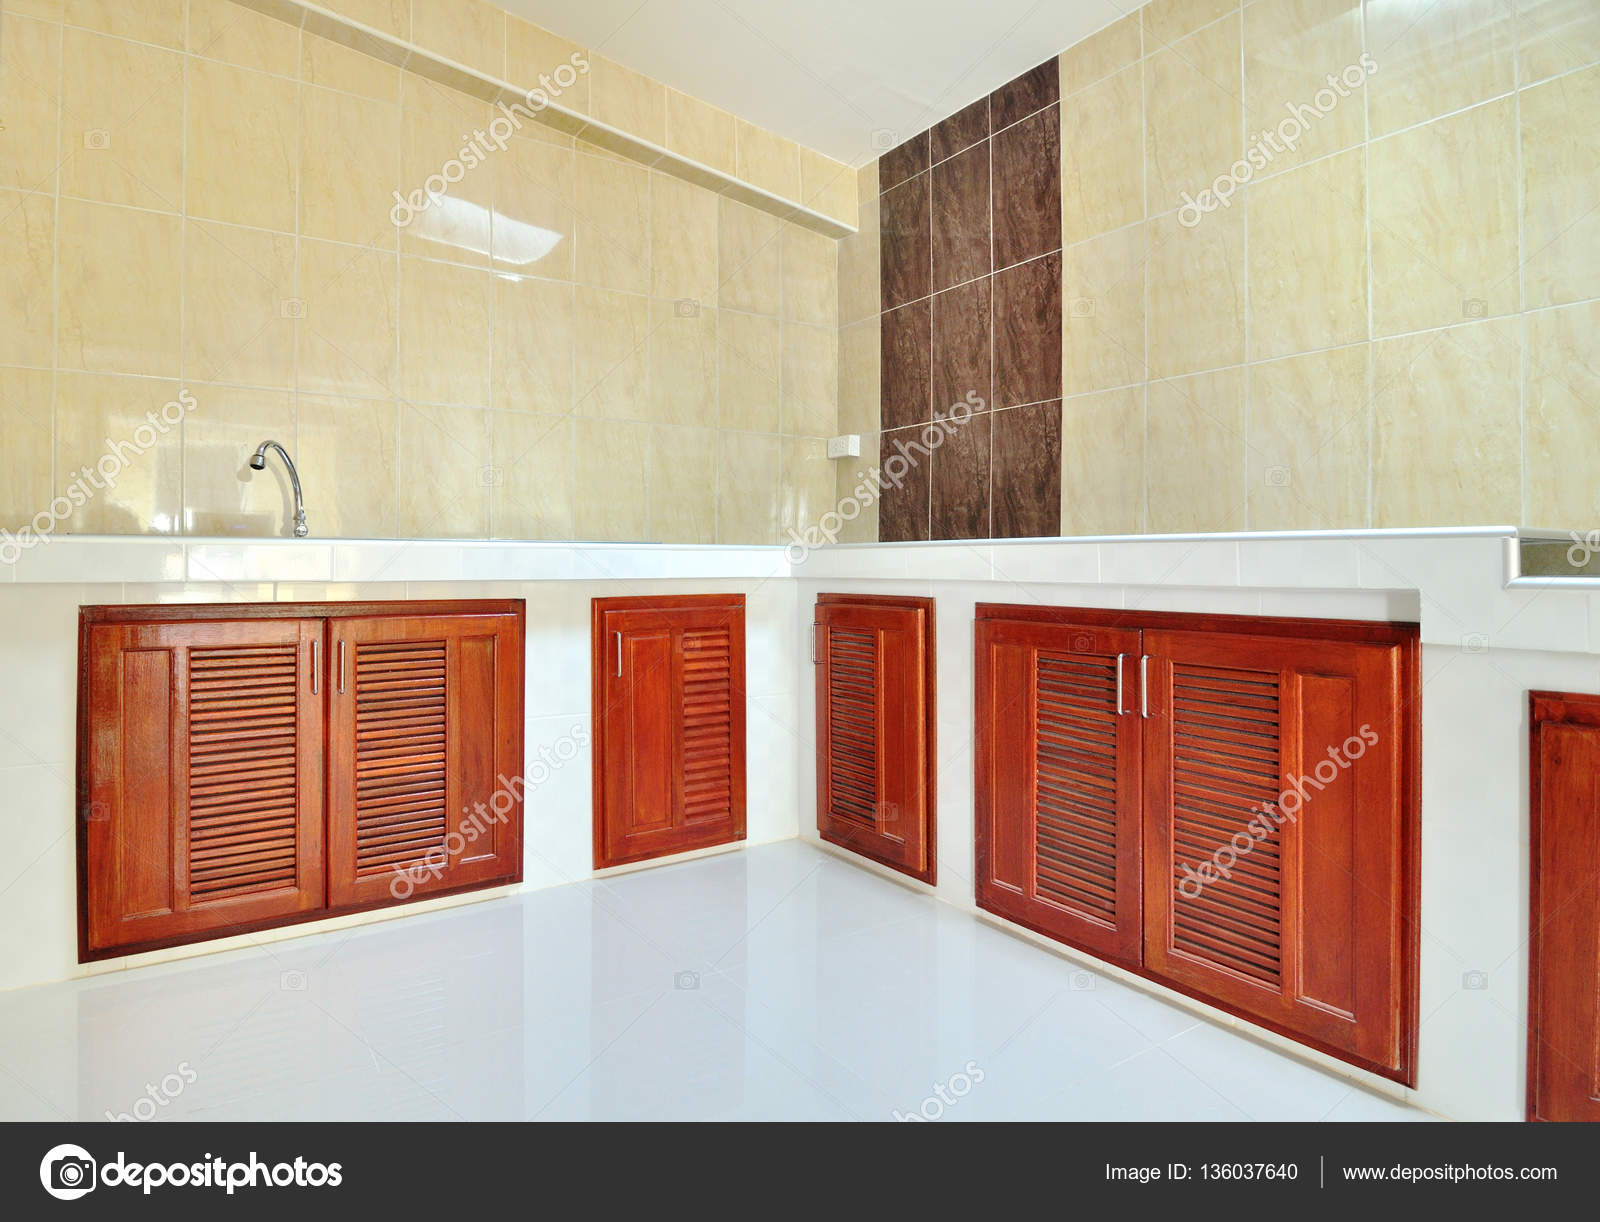 cuisine de comptoir de béton vide avec carrelage mural beige ...